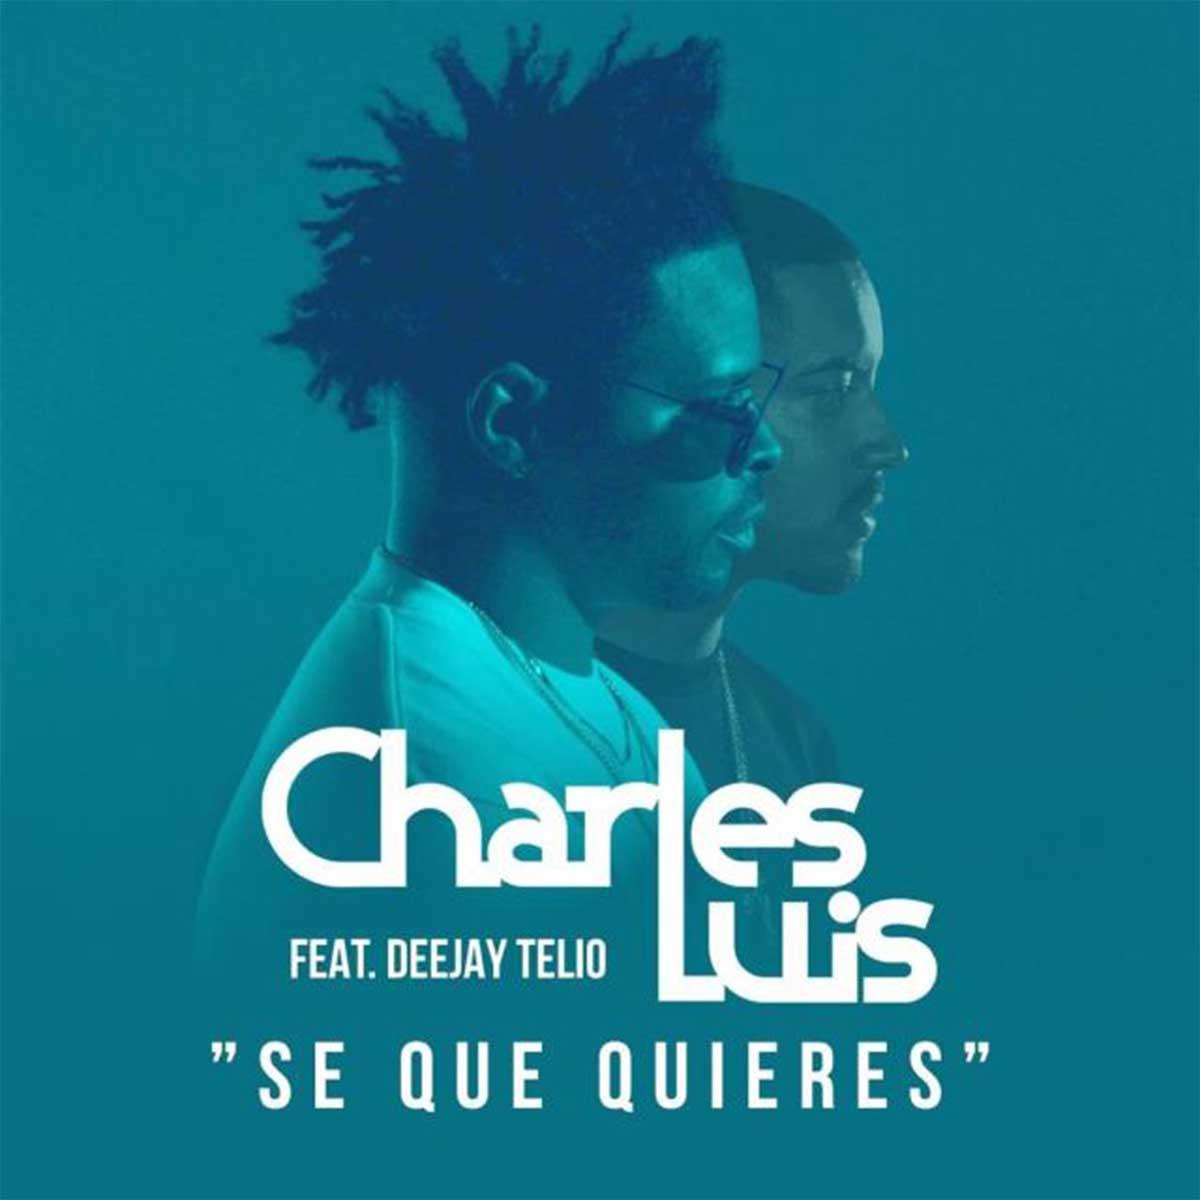 Charles Luis - Se Que Quieres (feat. Deejay Telio)